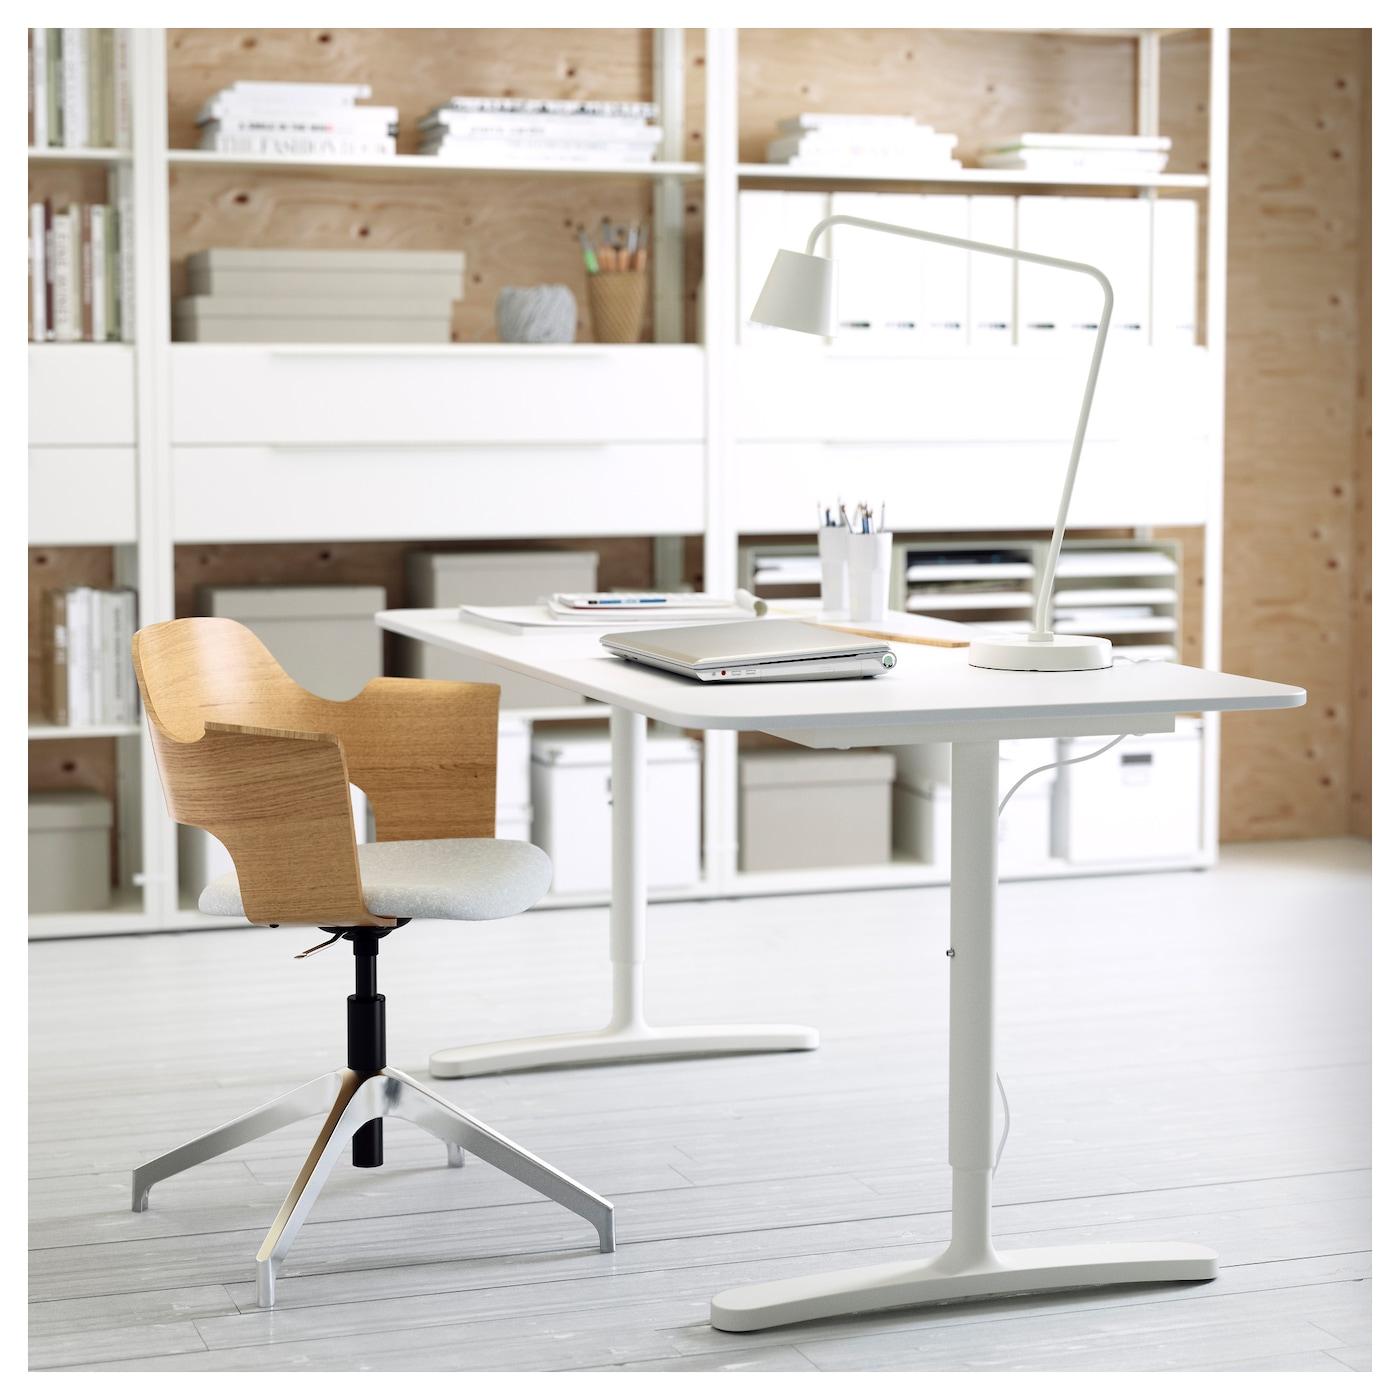 BEKANT Desk White 160x80 cm IKEA